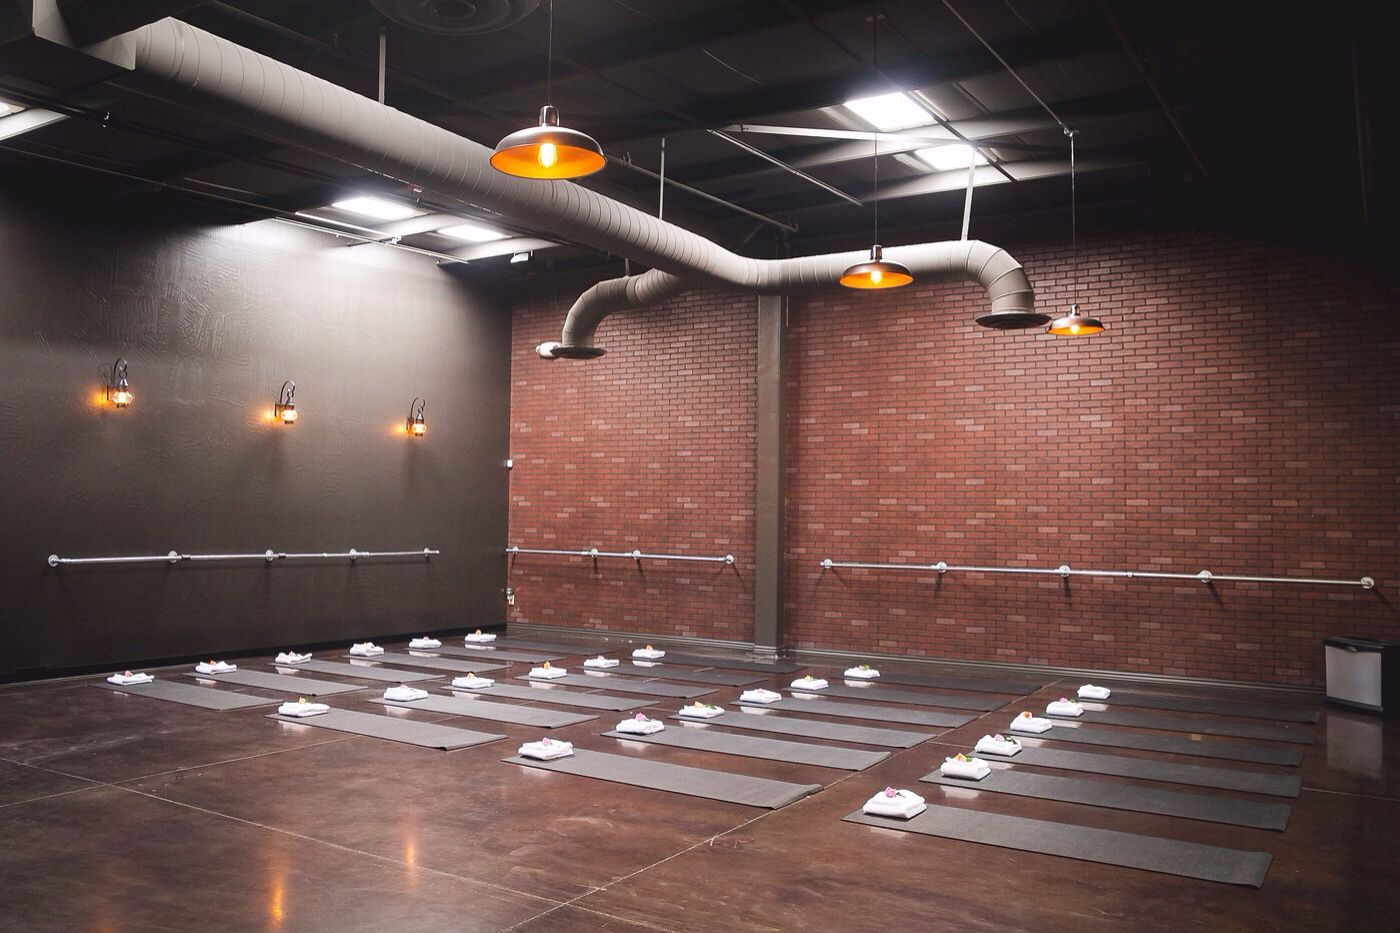 VINYASA FIT Hot yoga studio. Prescott Valley, Arizona